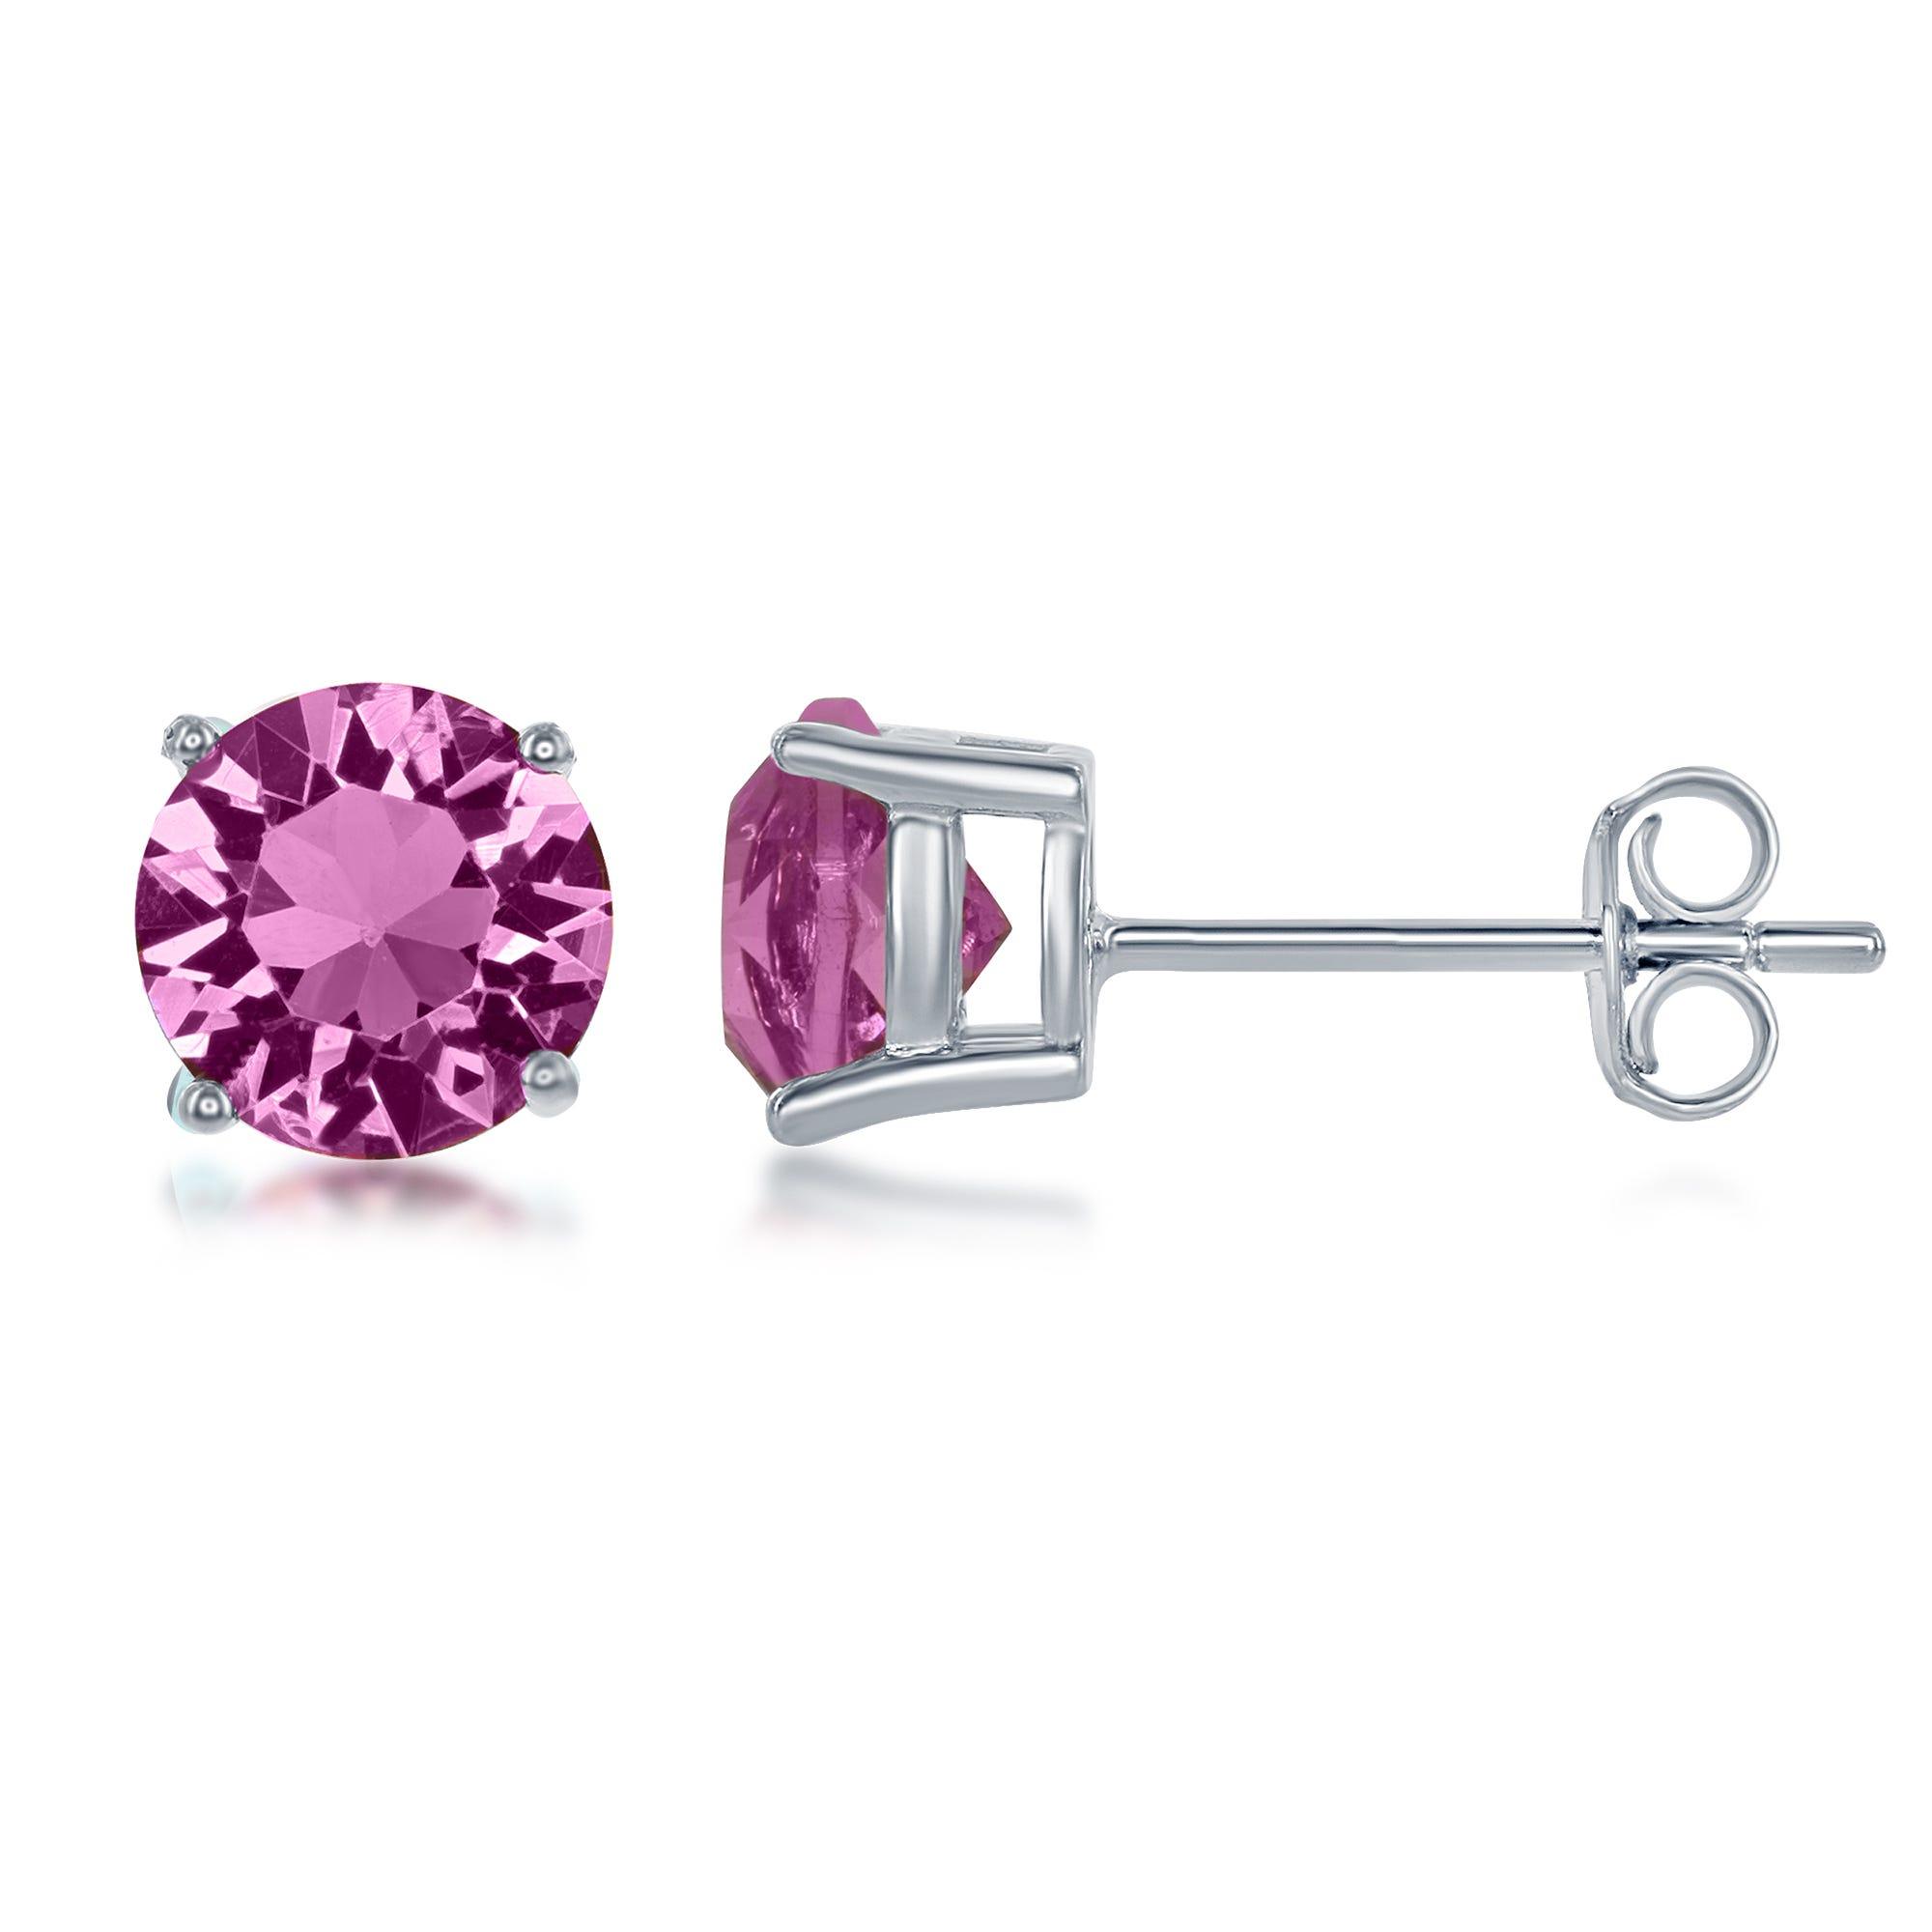 October Swarovski Crystal Earrings in Sterling Silver